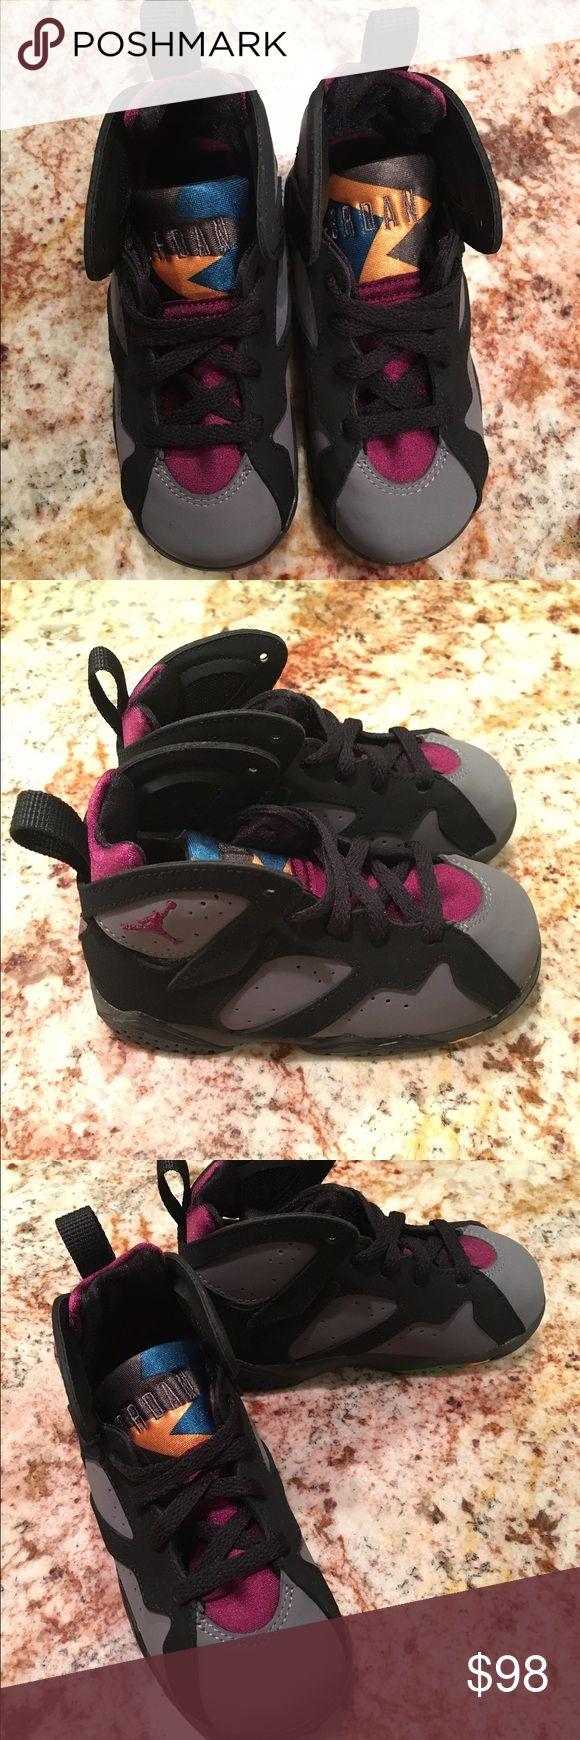 Toddler Jordan Retro 7 Bordeaux Toddler Jordan Retro 7 Bordeaux NEW!!! 💙 Jordan Shoes Sneakers